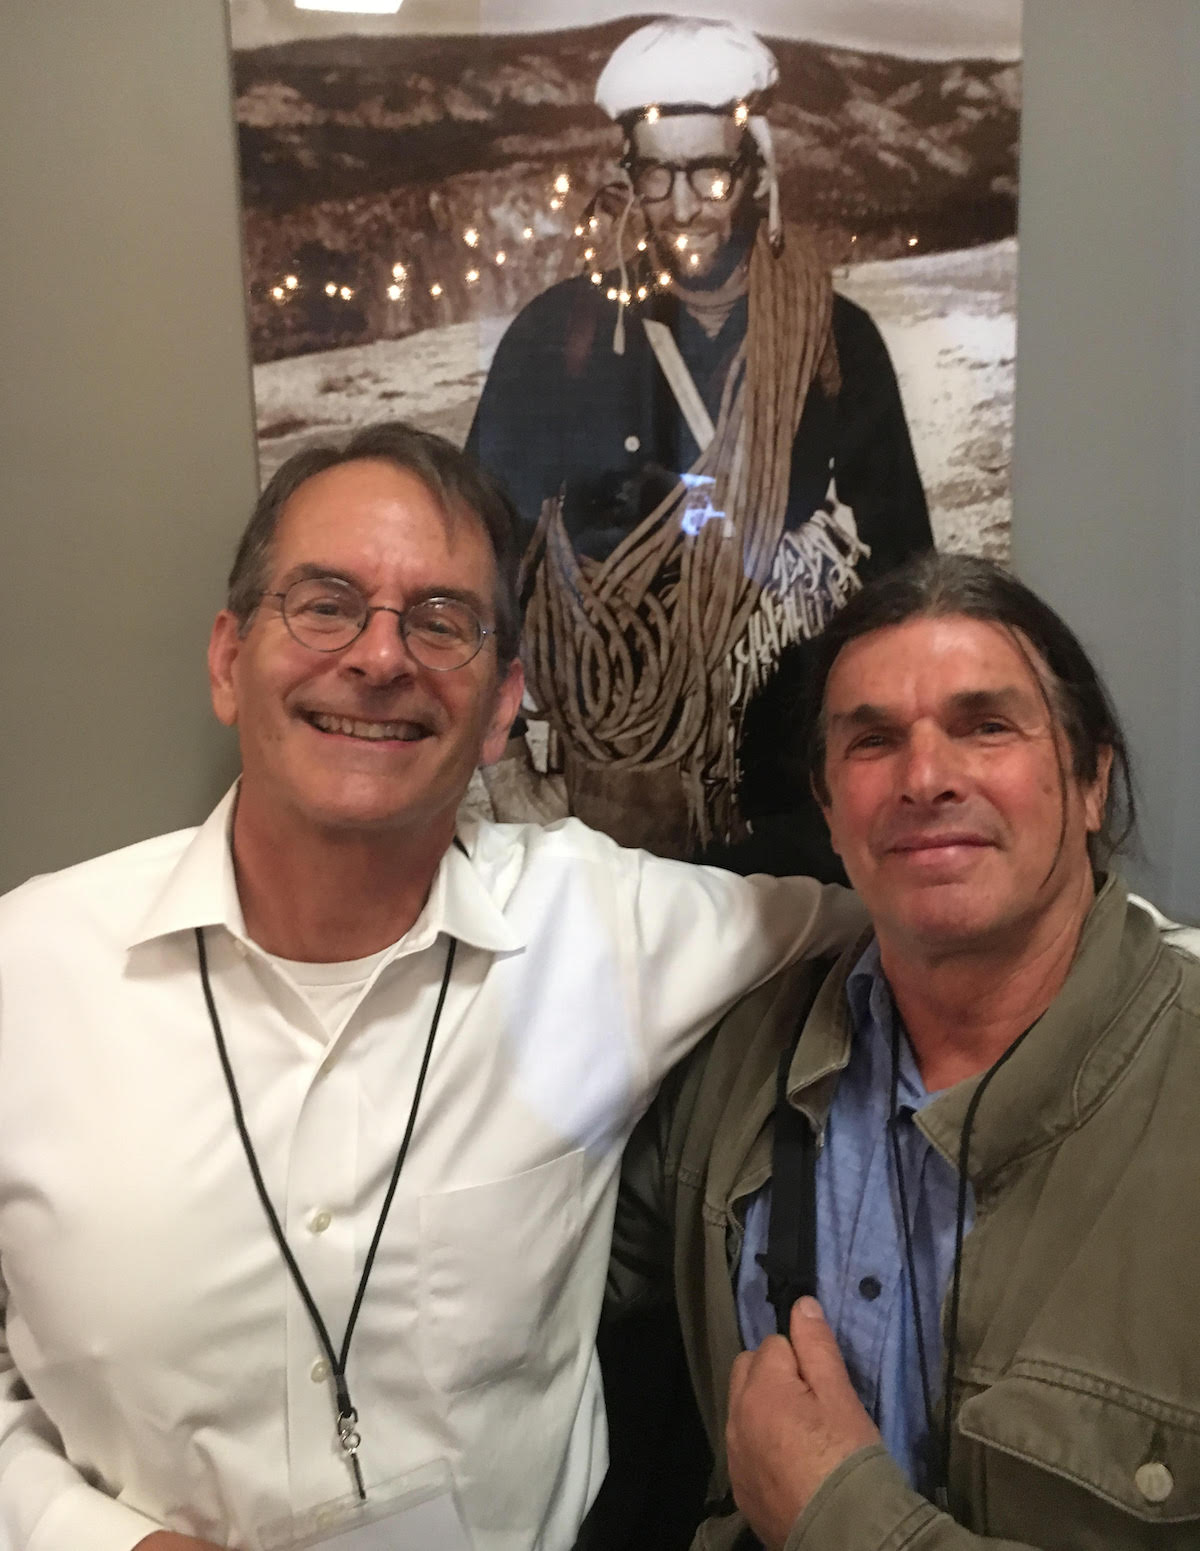 Rick Accomazzo and Ron Kauk. [Photo] Derek Franz